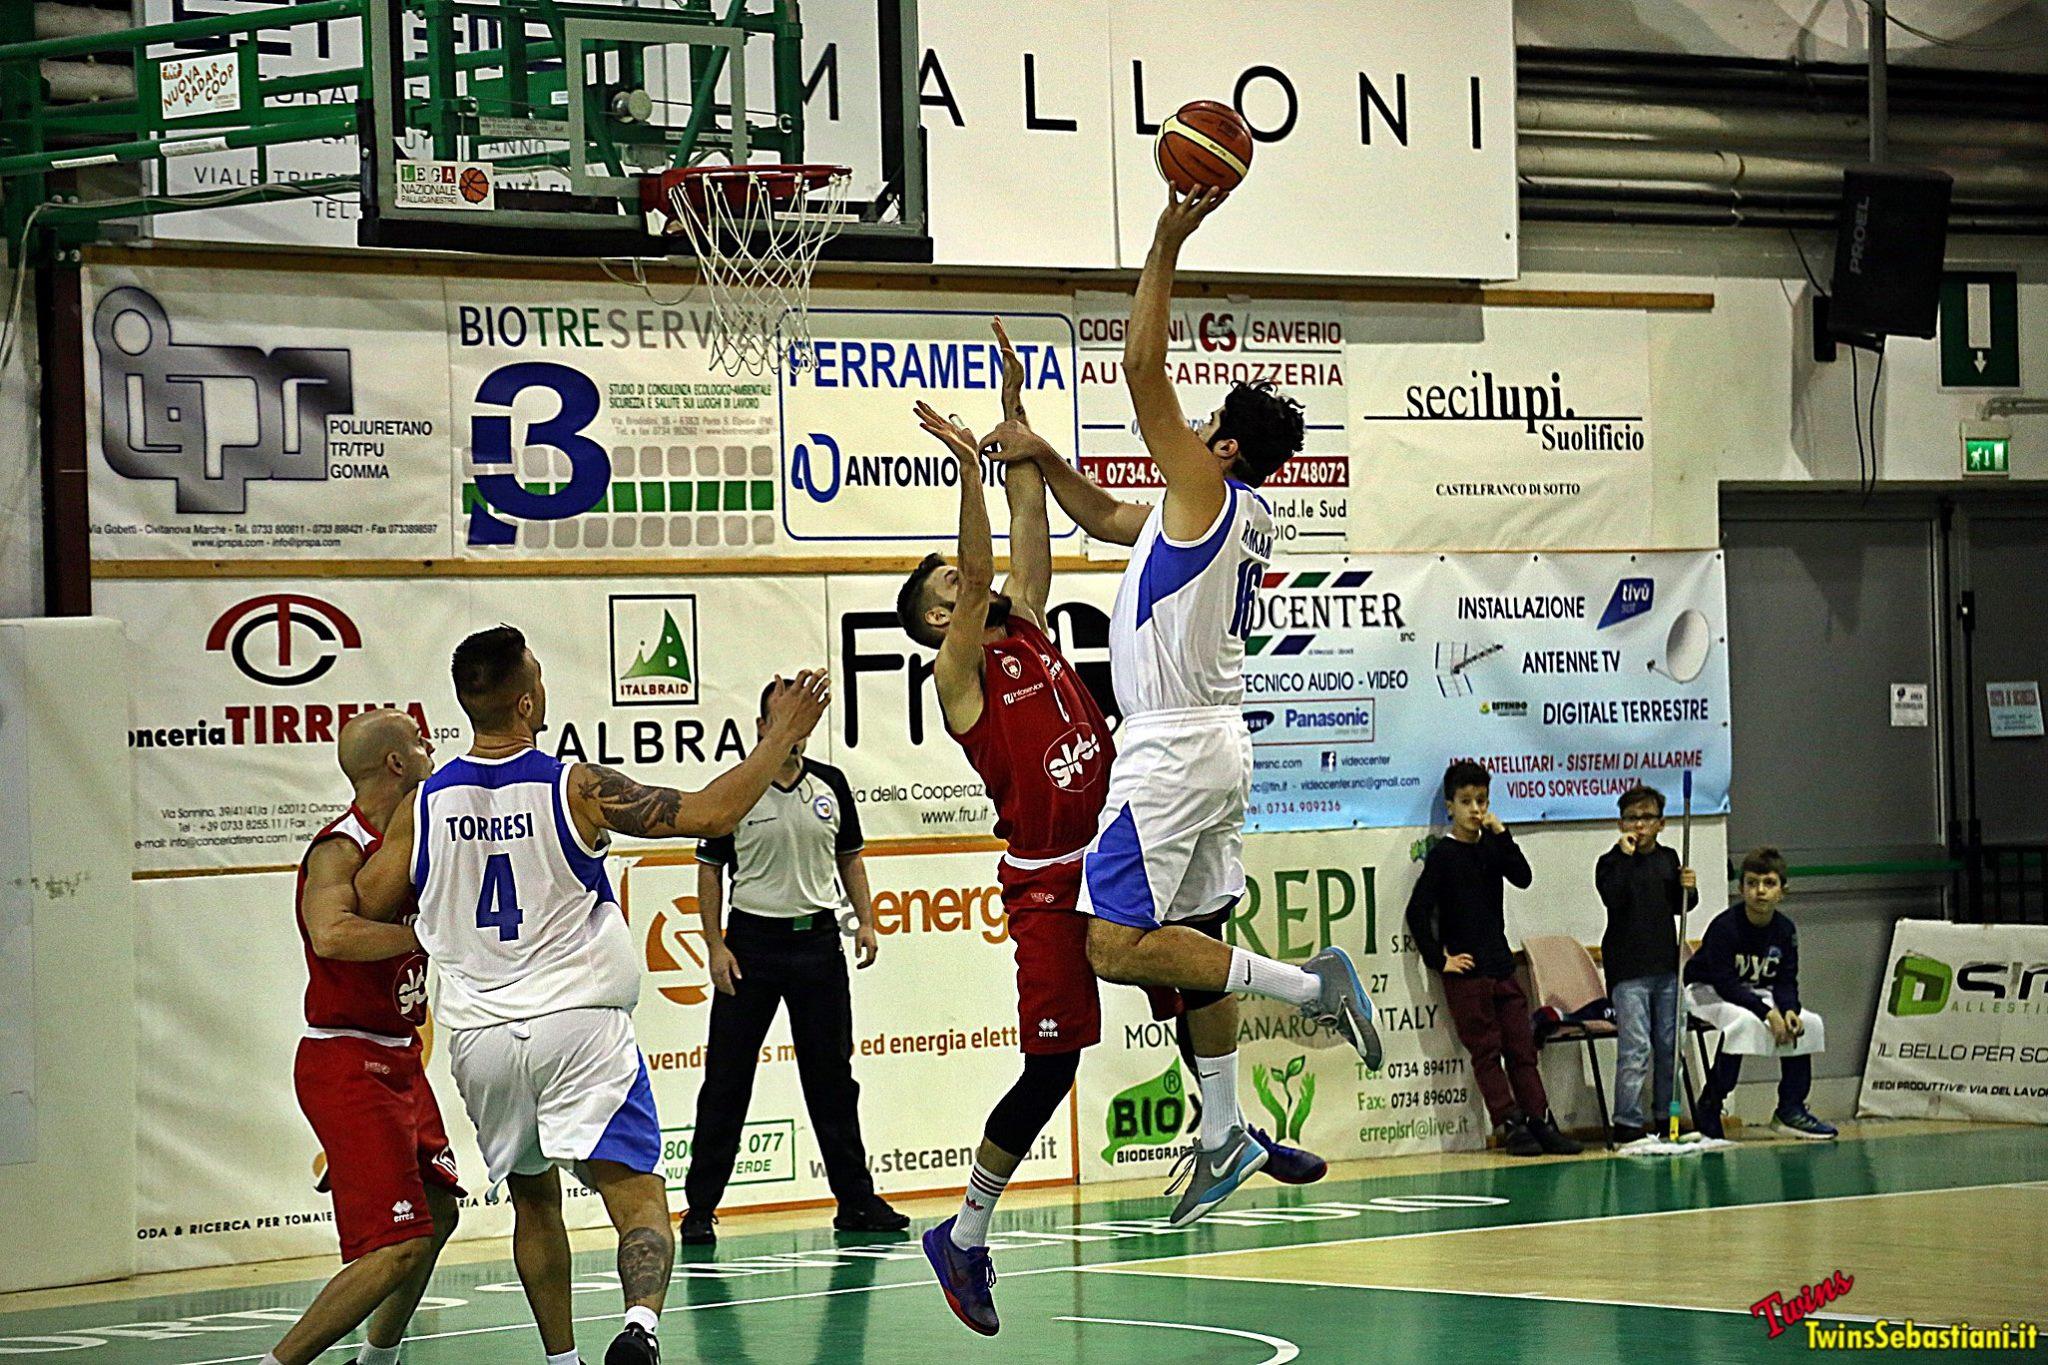 Malloni - Taranto, playoff se…